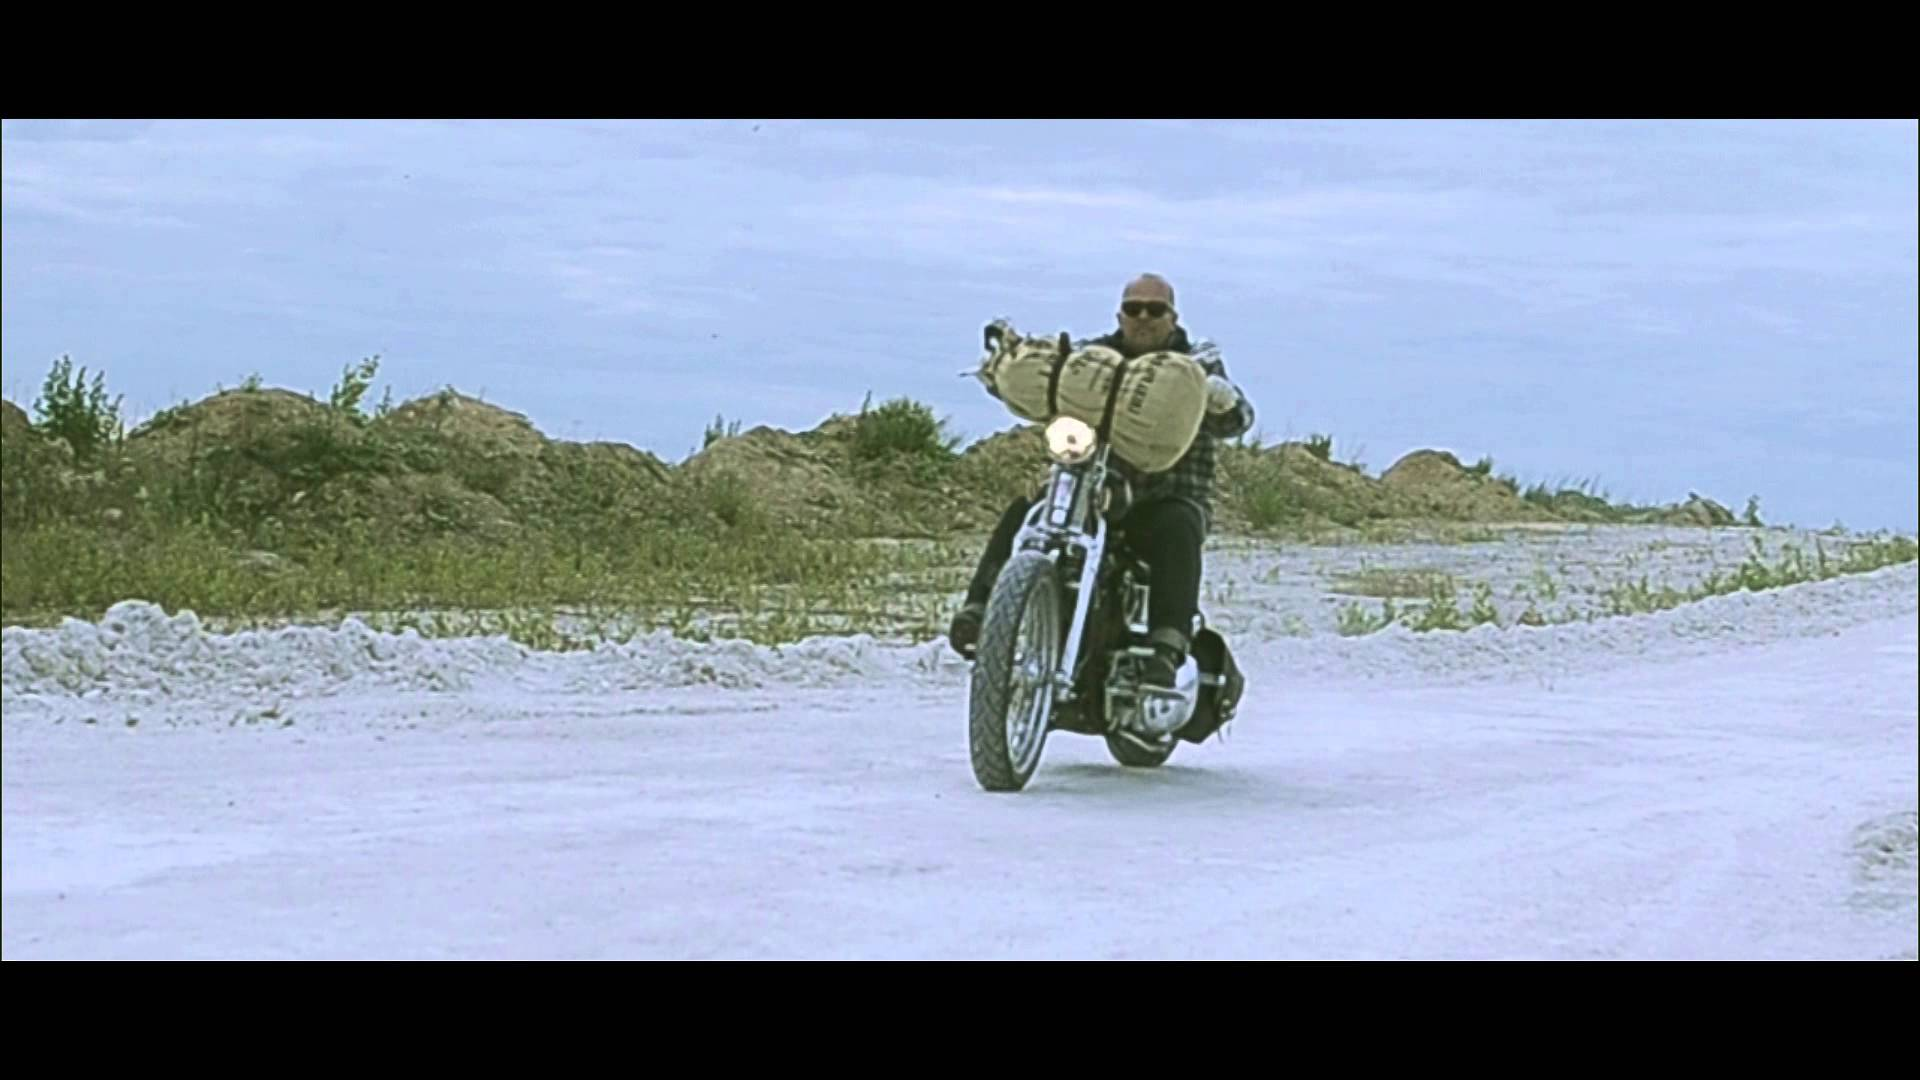 Snail Chopper Run (2015) - trailer